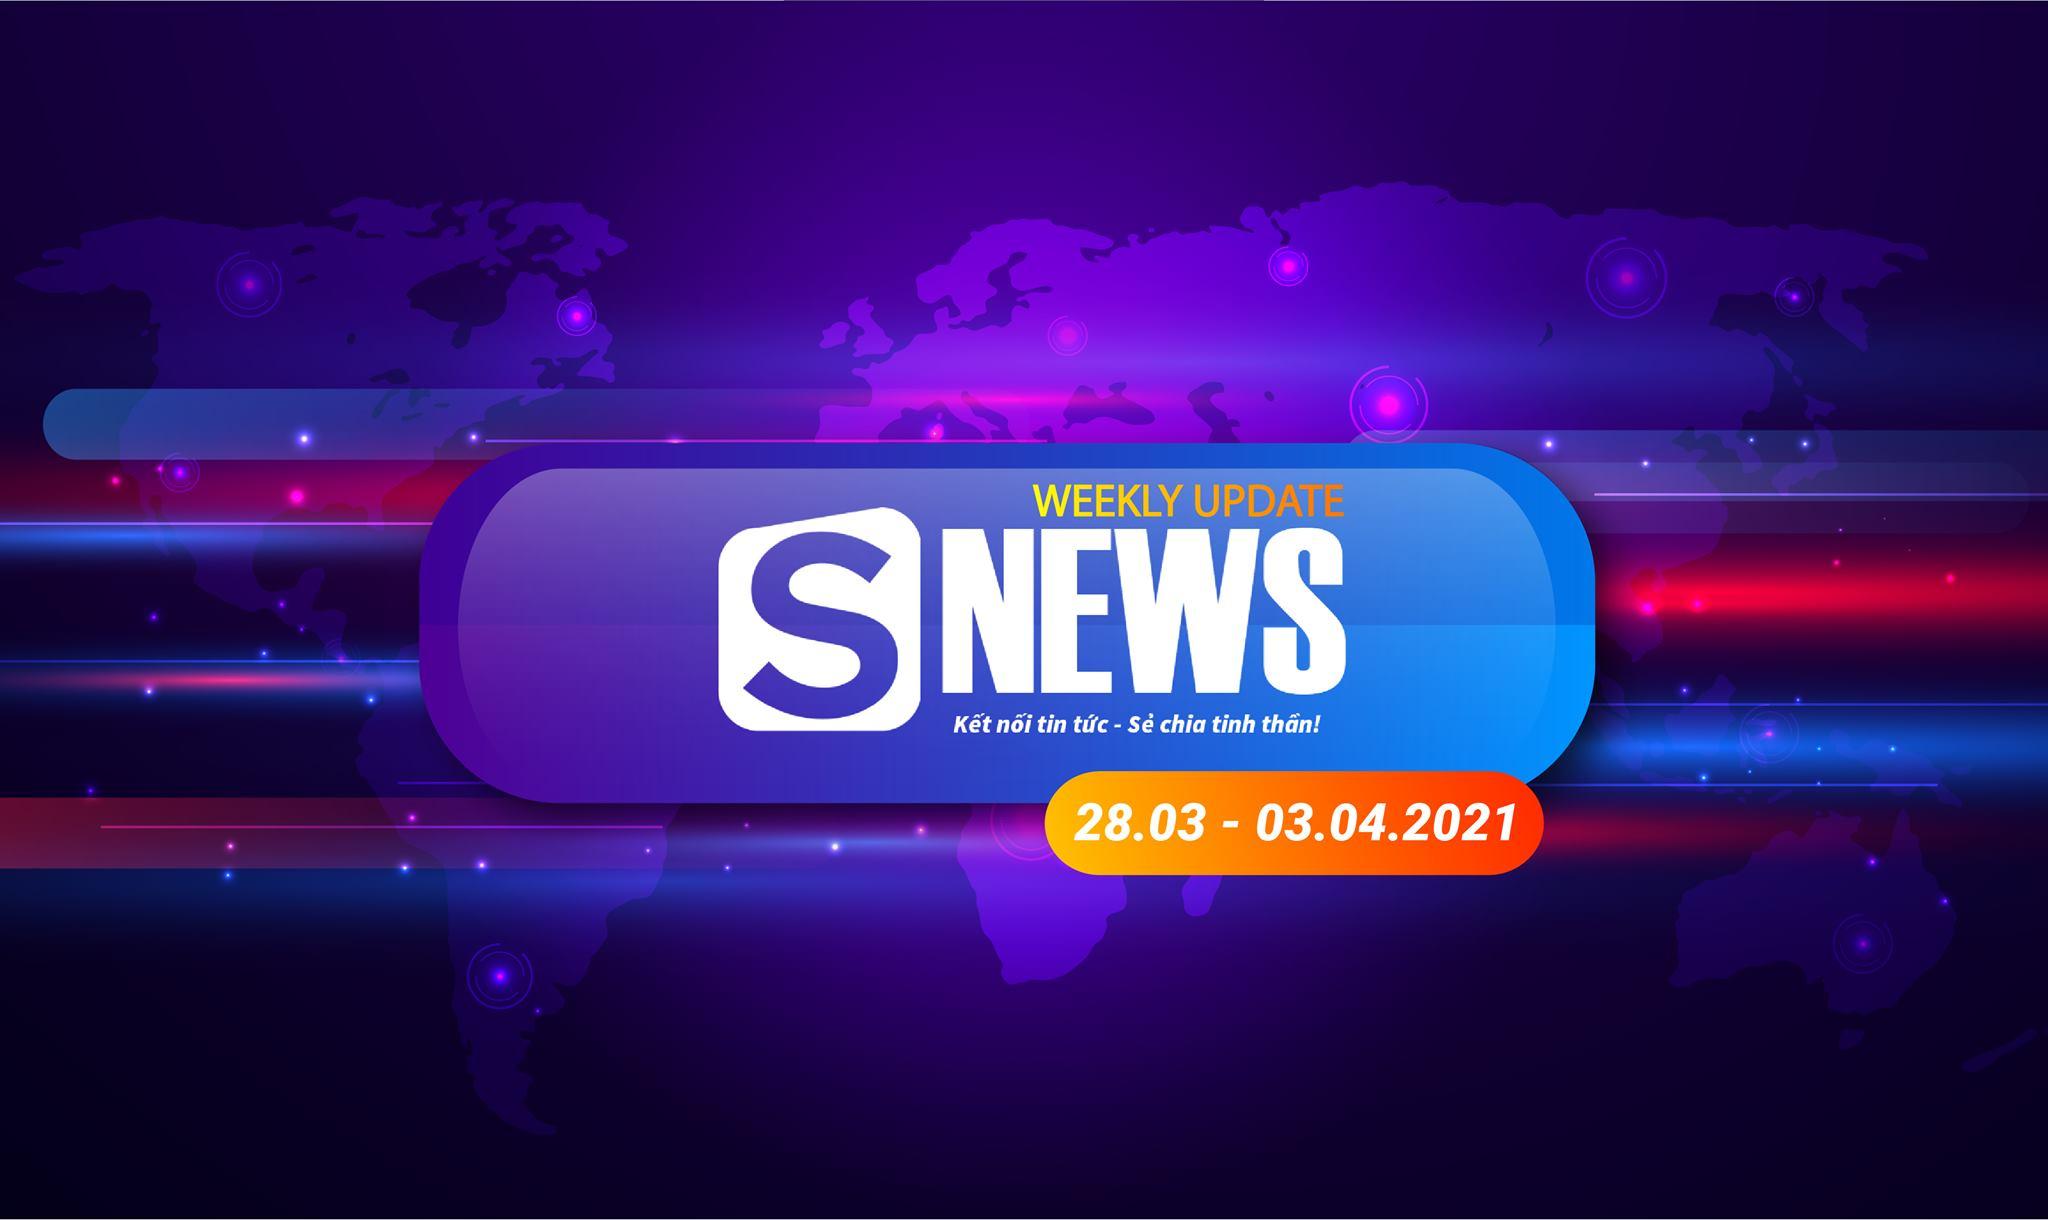 Tổng hợp tin tức Sapo tuần qua: 28.03 - 03.04.2021